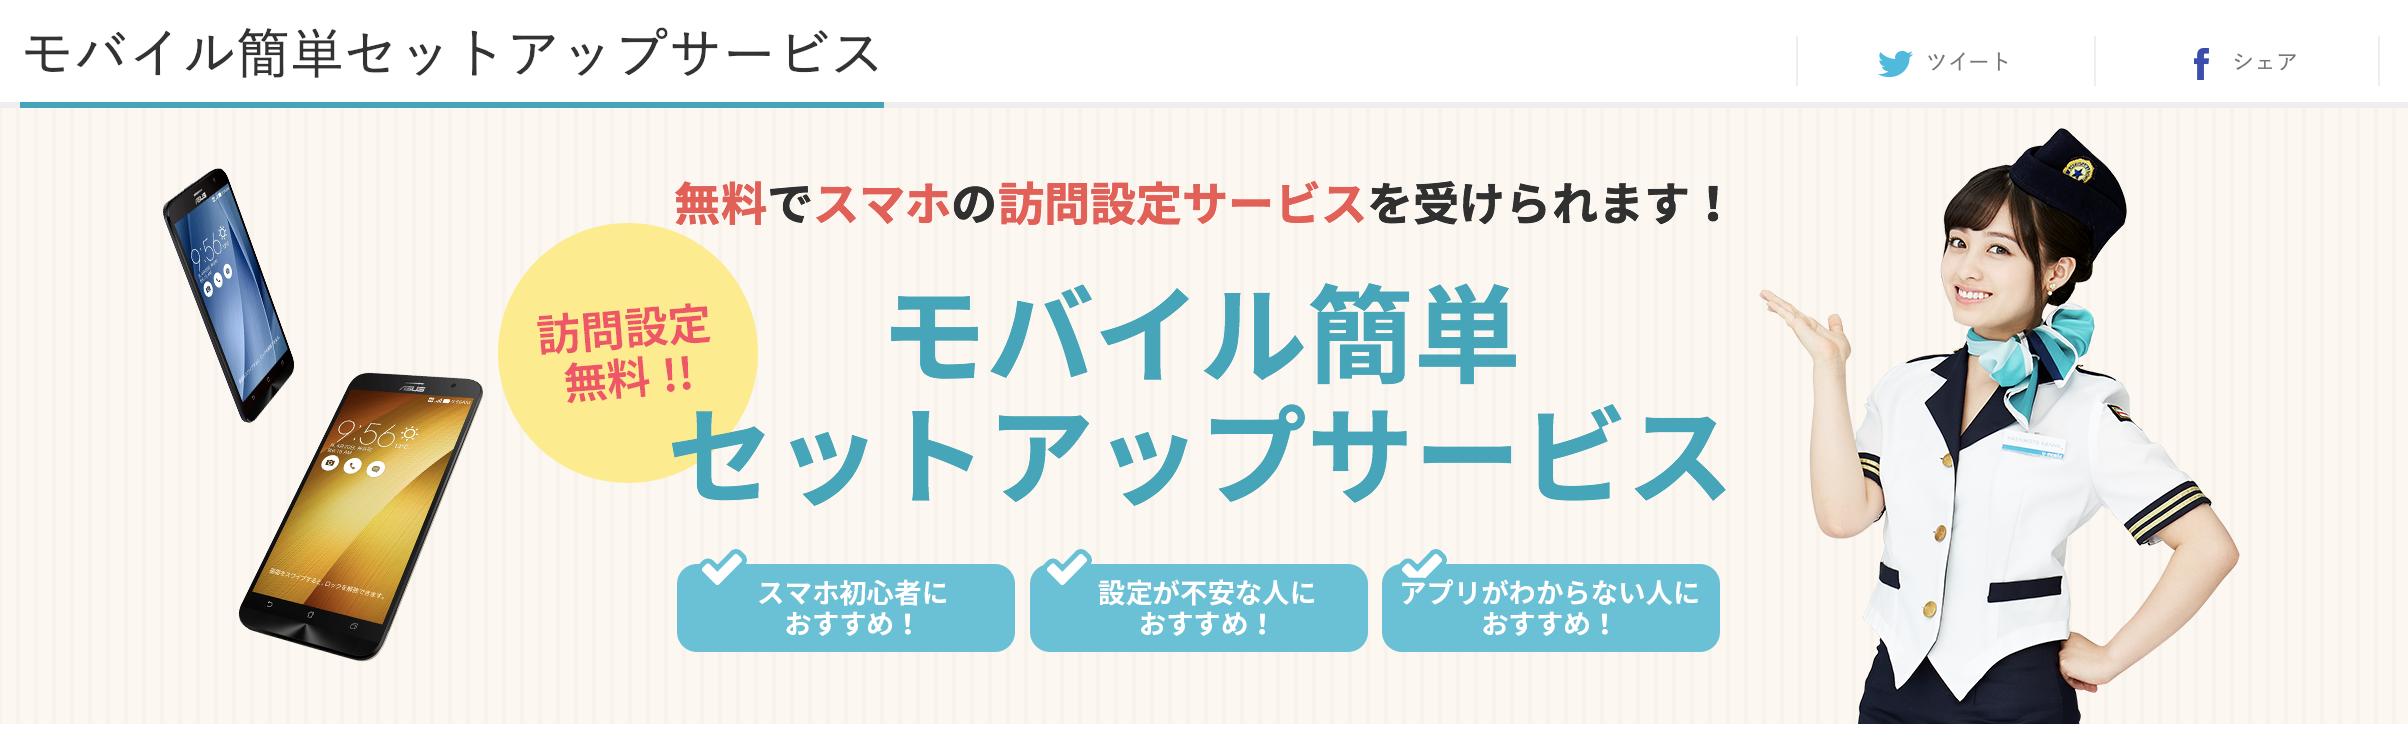 U-mobile セットアップ